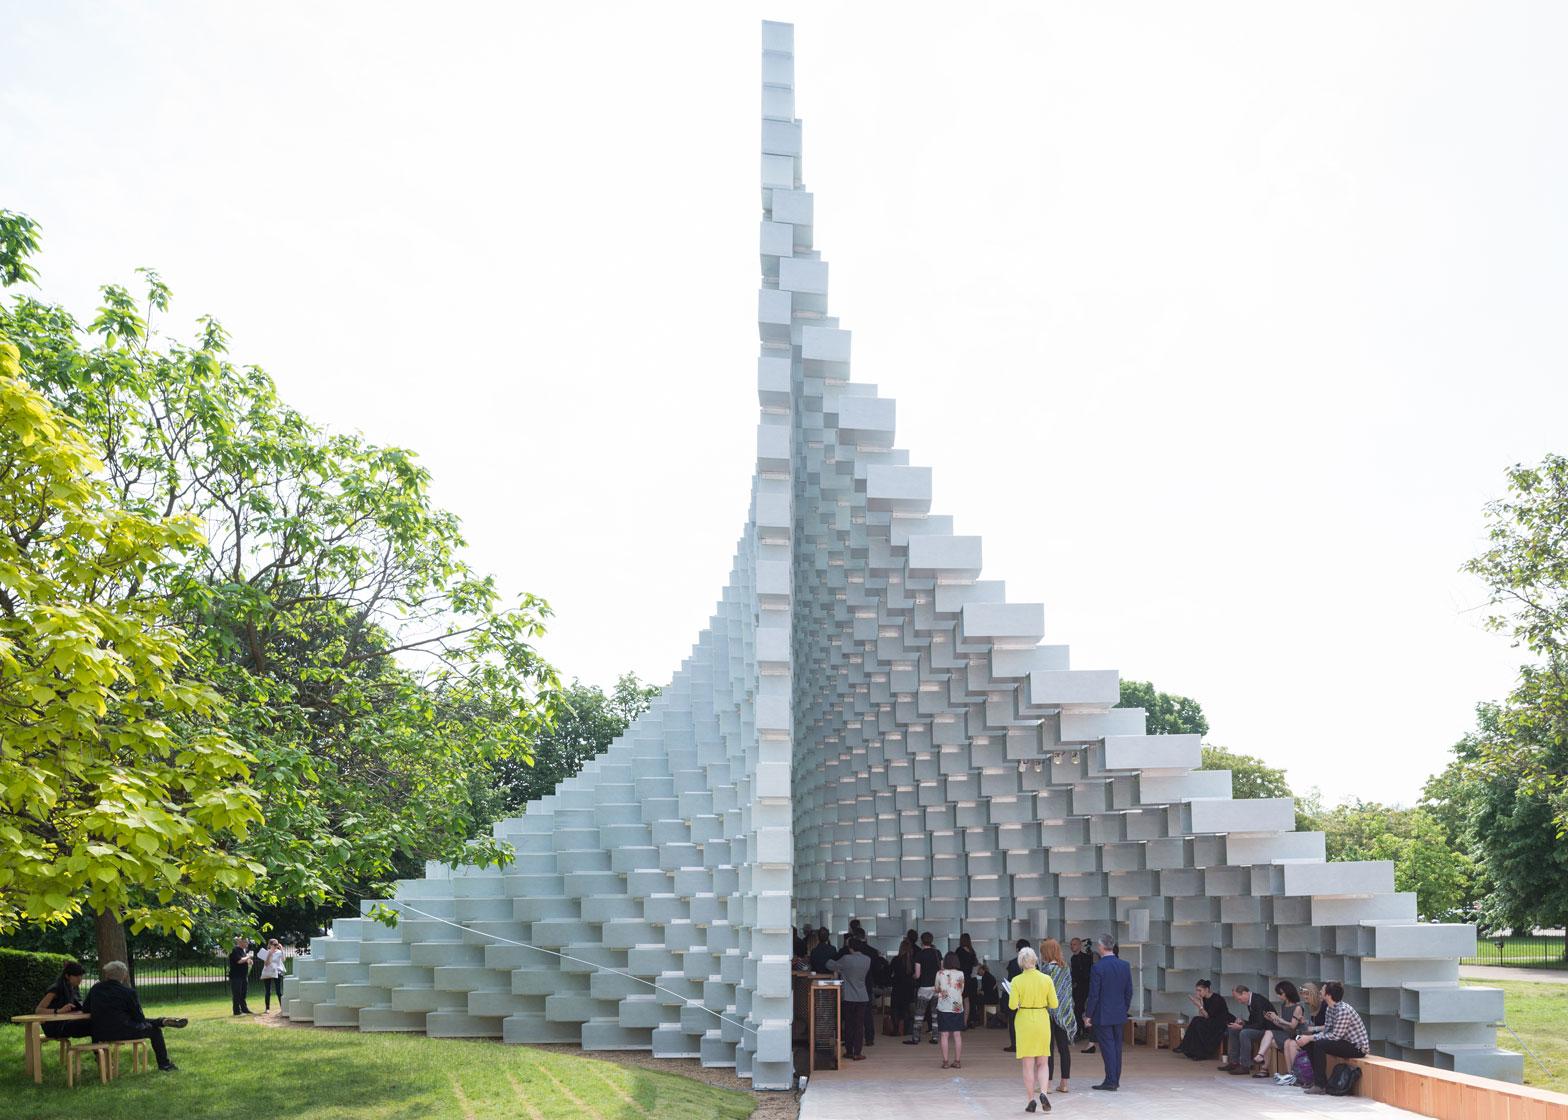 Serpentine Gallery Pavilion 2016 by Bjarke Ingels